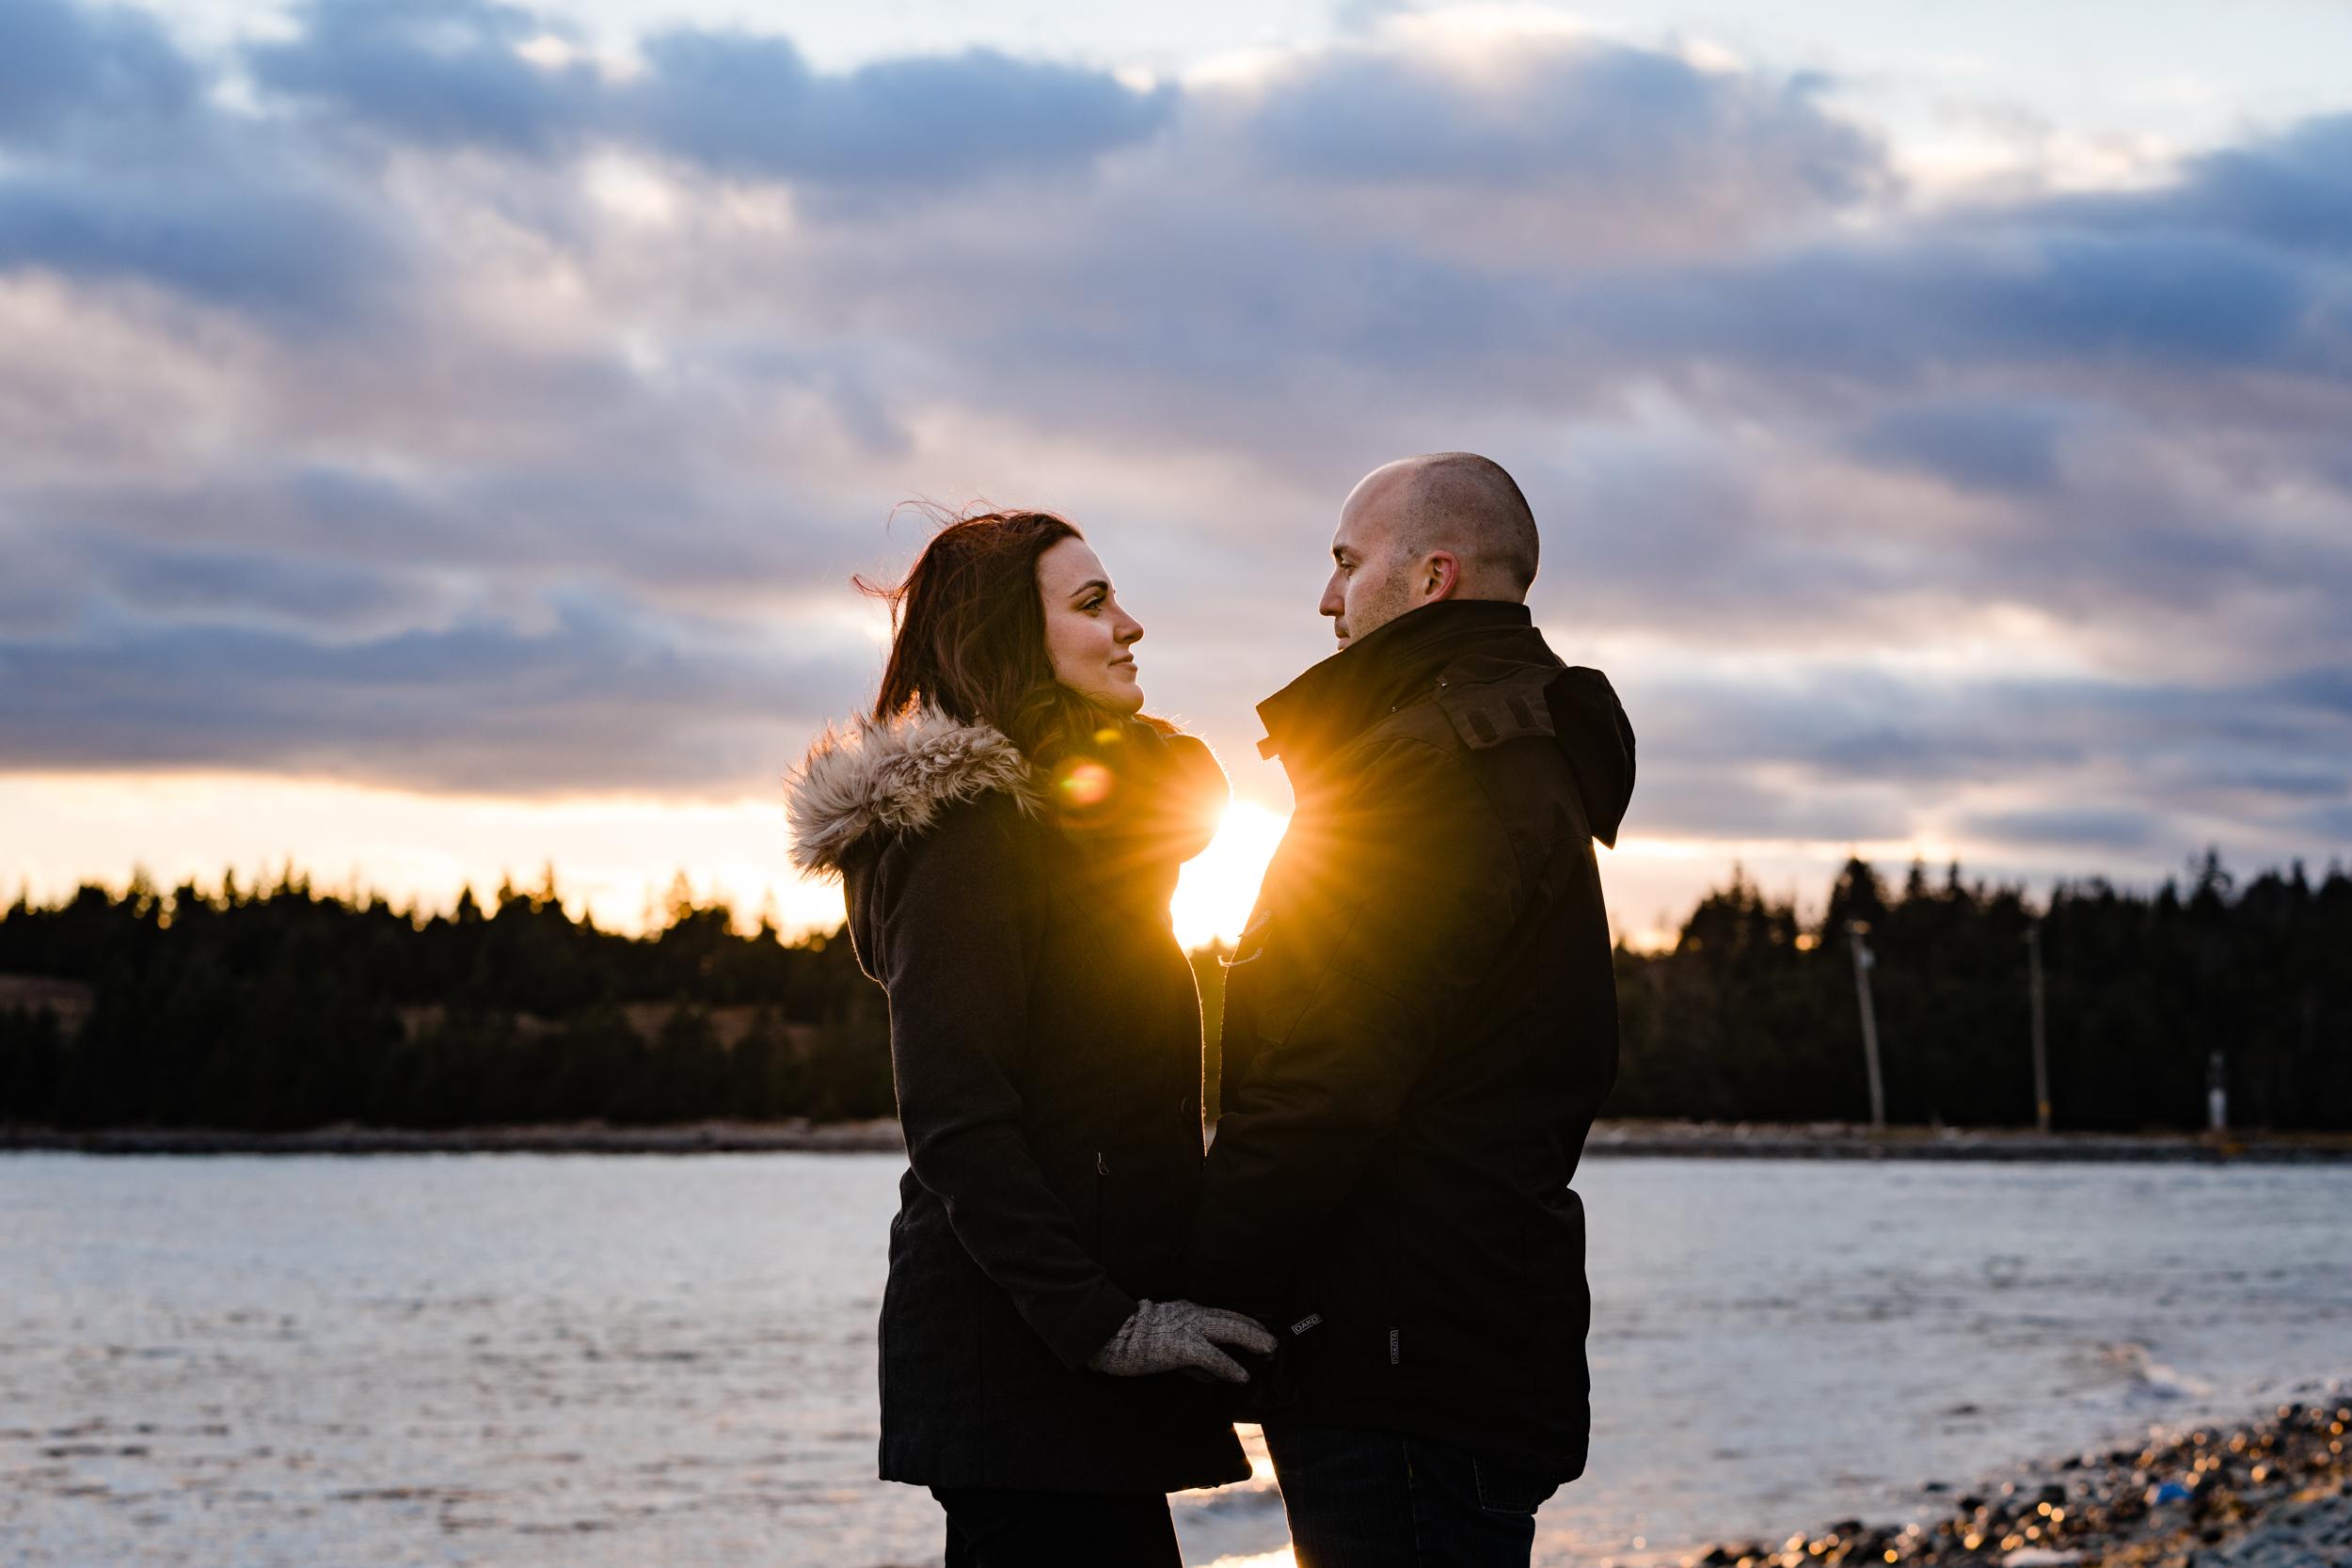 Sarah&Shayne-Halifax-engagement-weddingphotography-weddingphotographers-novascotia (33 of 41).jpg